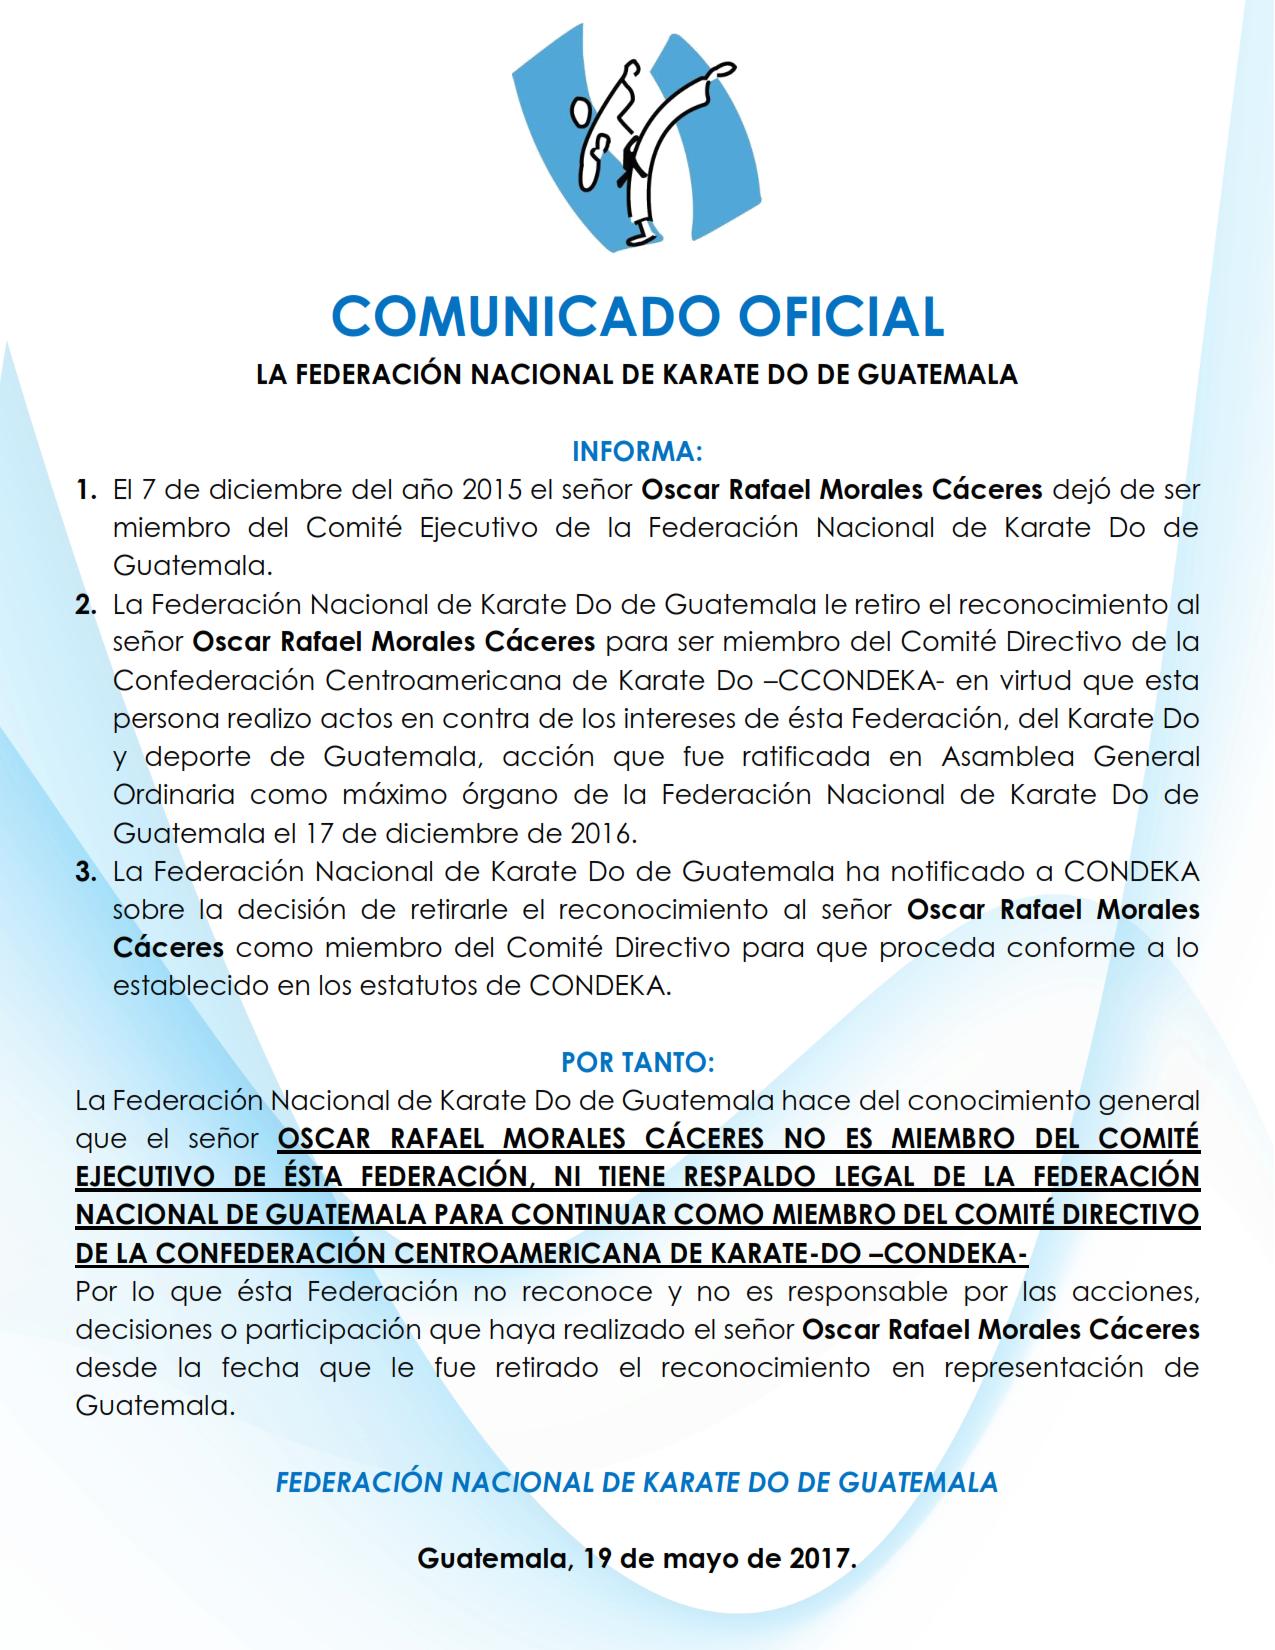 COMUNICADO OFICIAL2 001